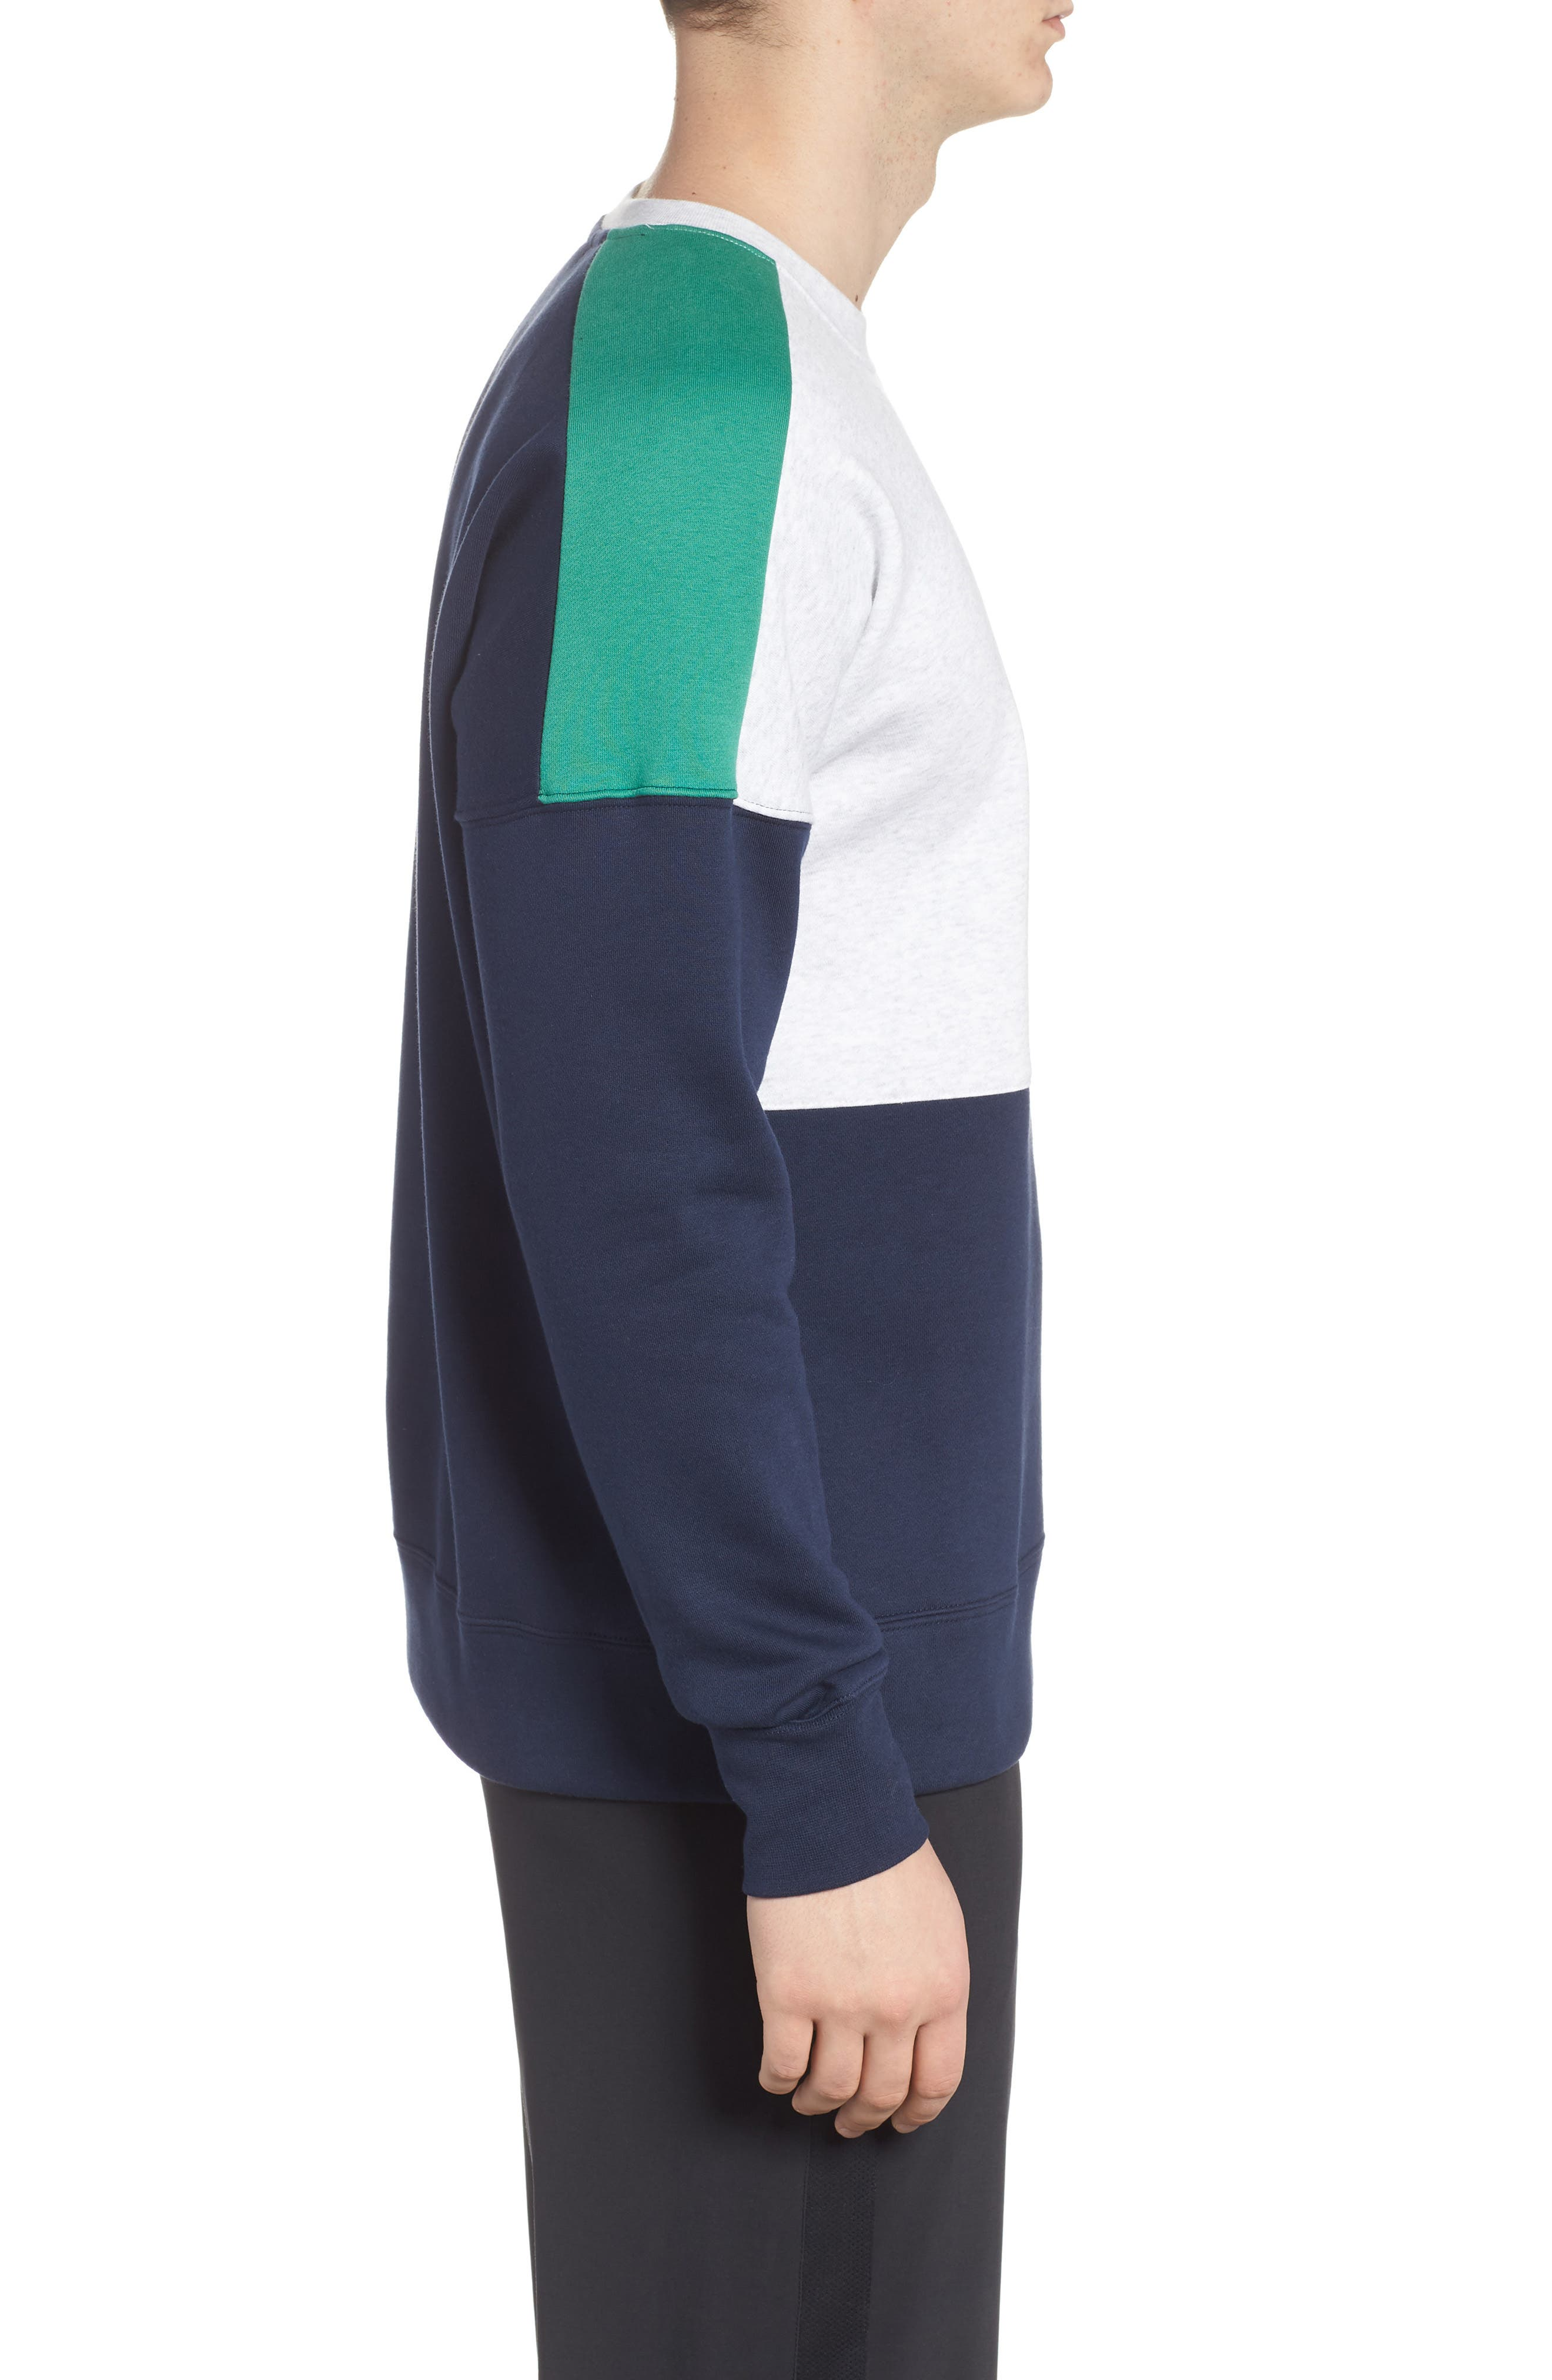 NSW Air Crewneck Sweatshirt,                             Alternate thumbnail 3, color,                             Birch/ Green/ Obsidian/ White